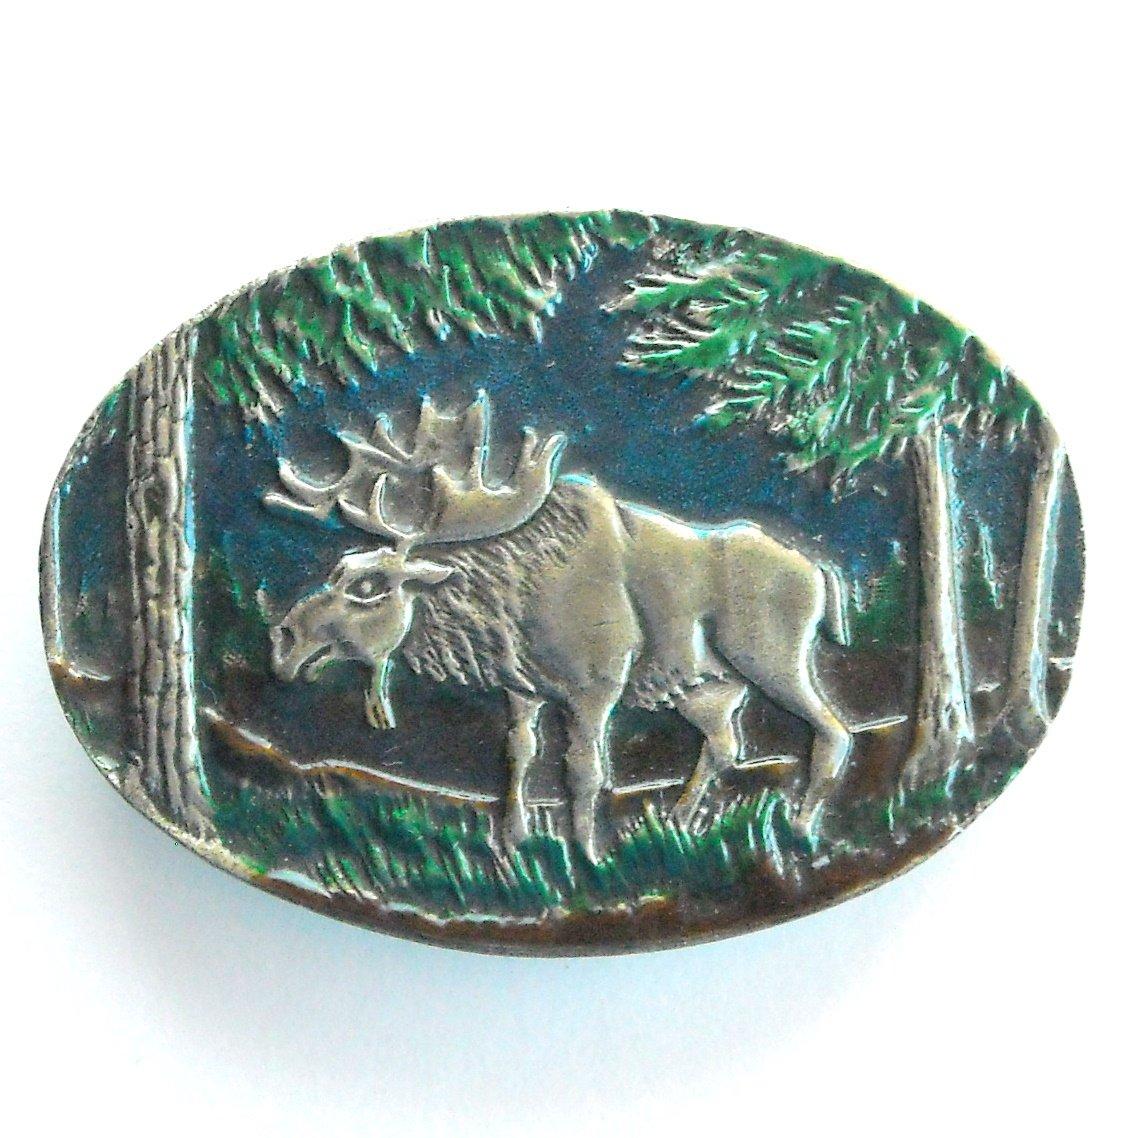 Alaska Moose Indiana Metal Craft American Belt Buckle